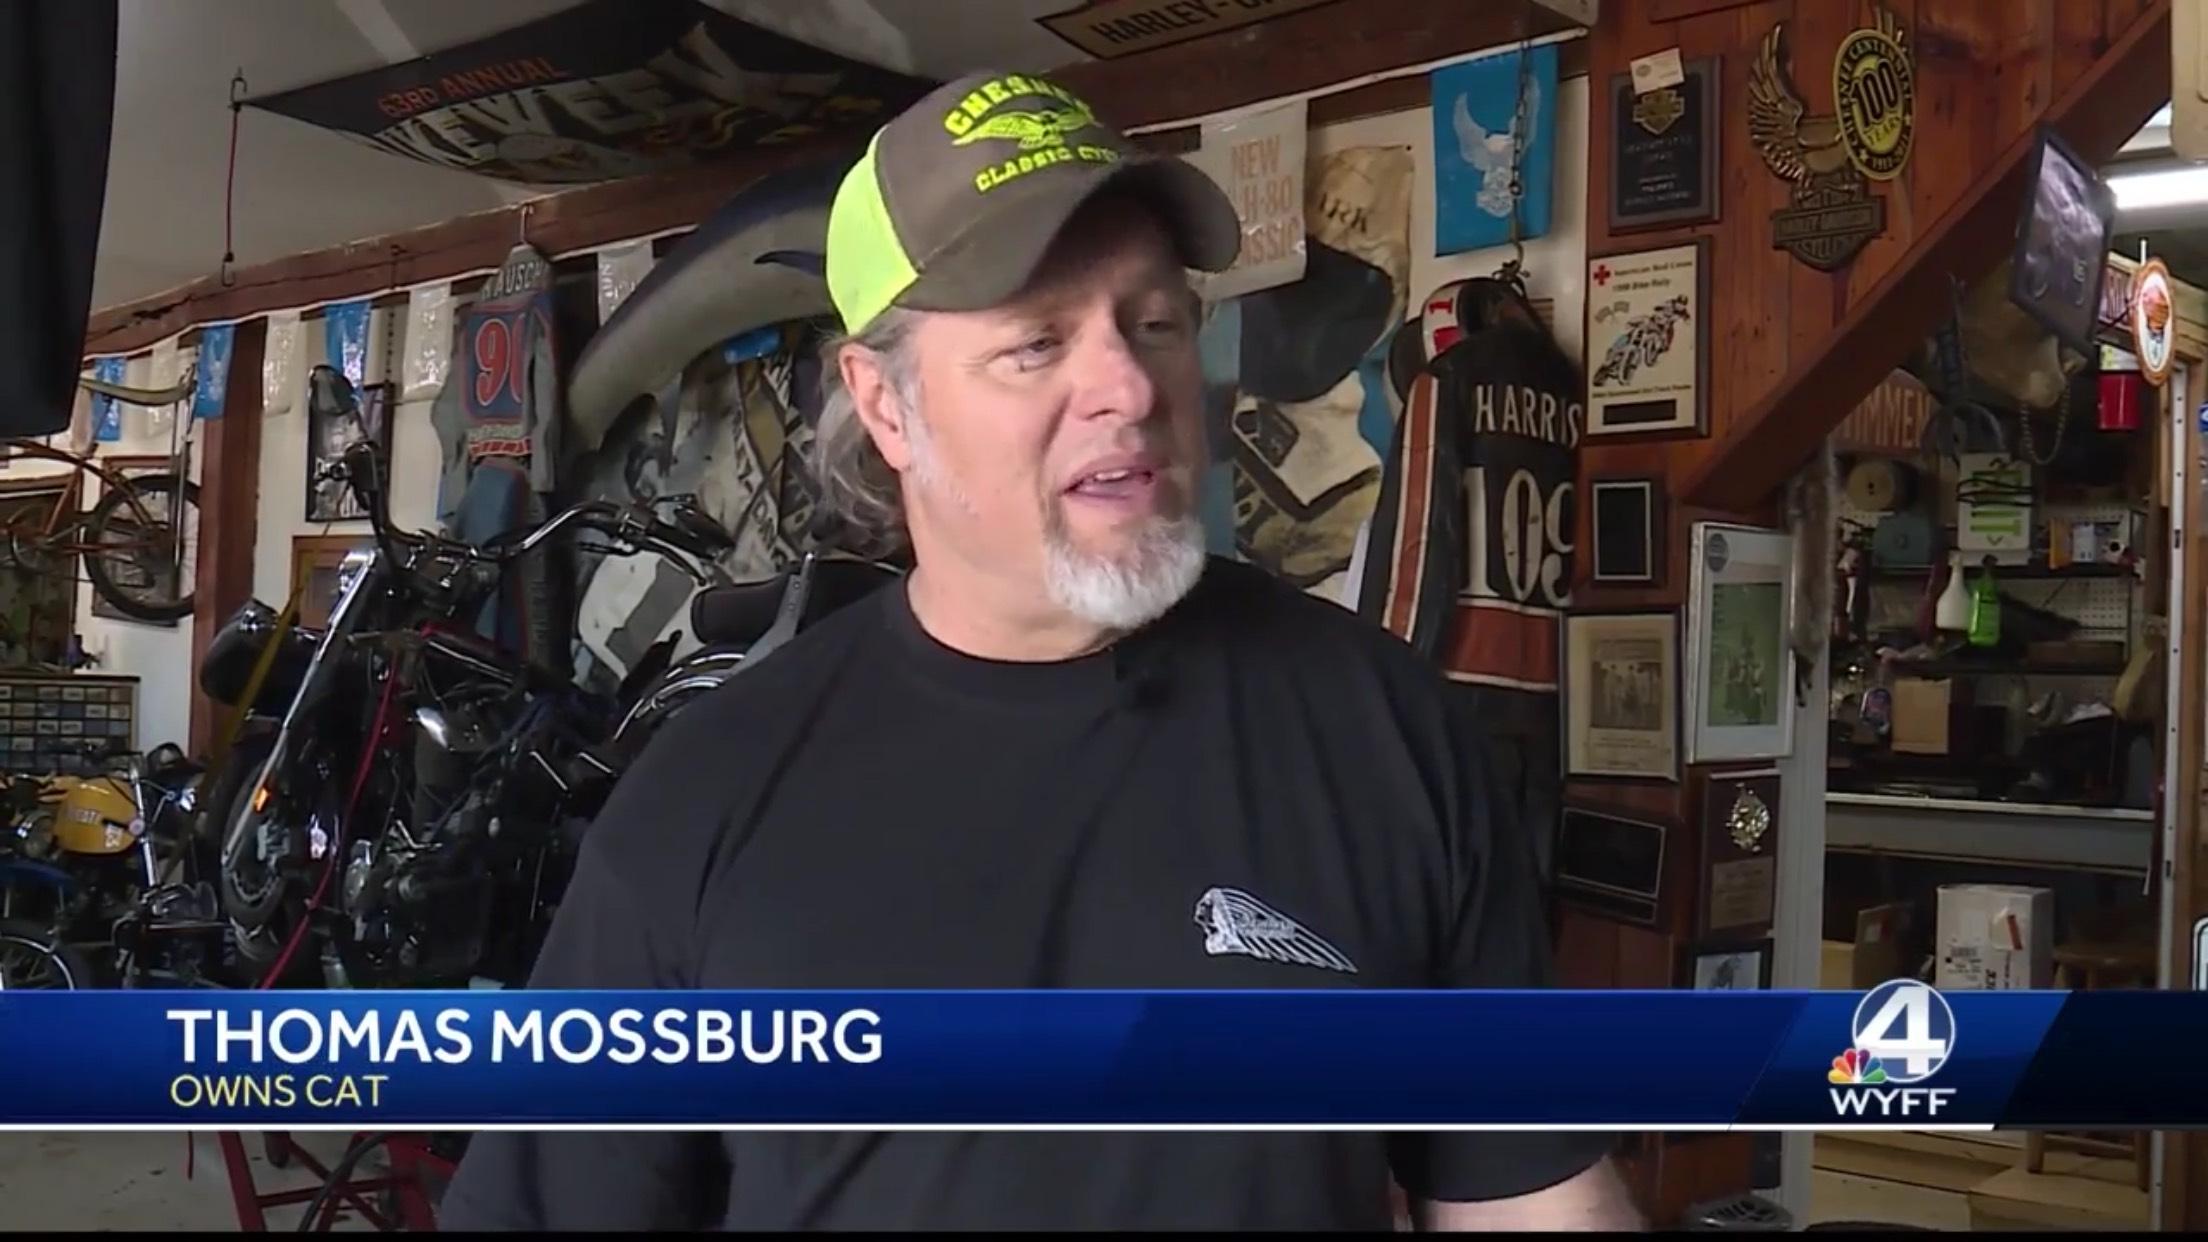 Thomas Mossburg: Owns Cat